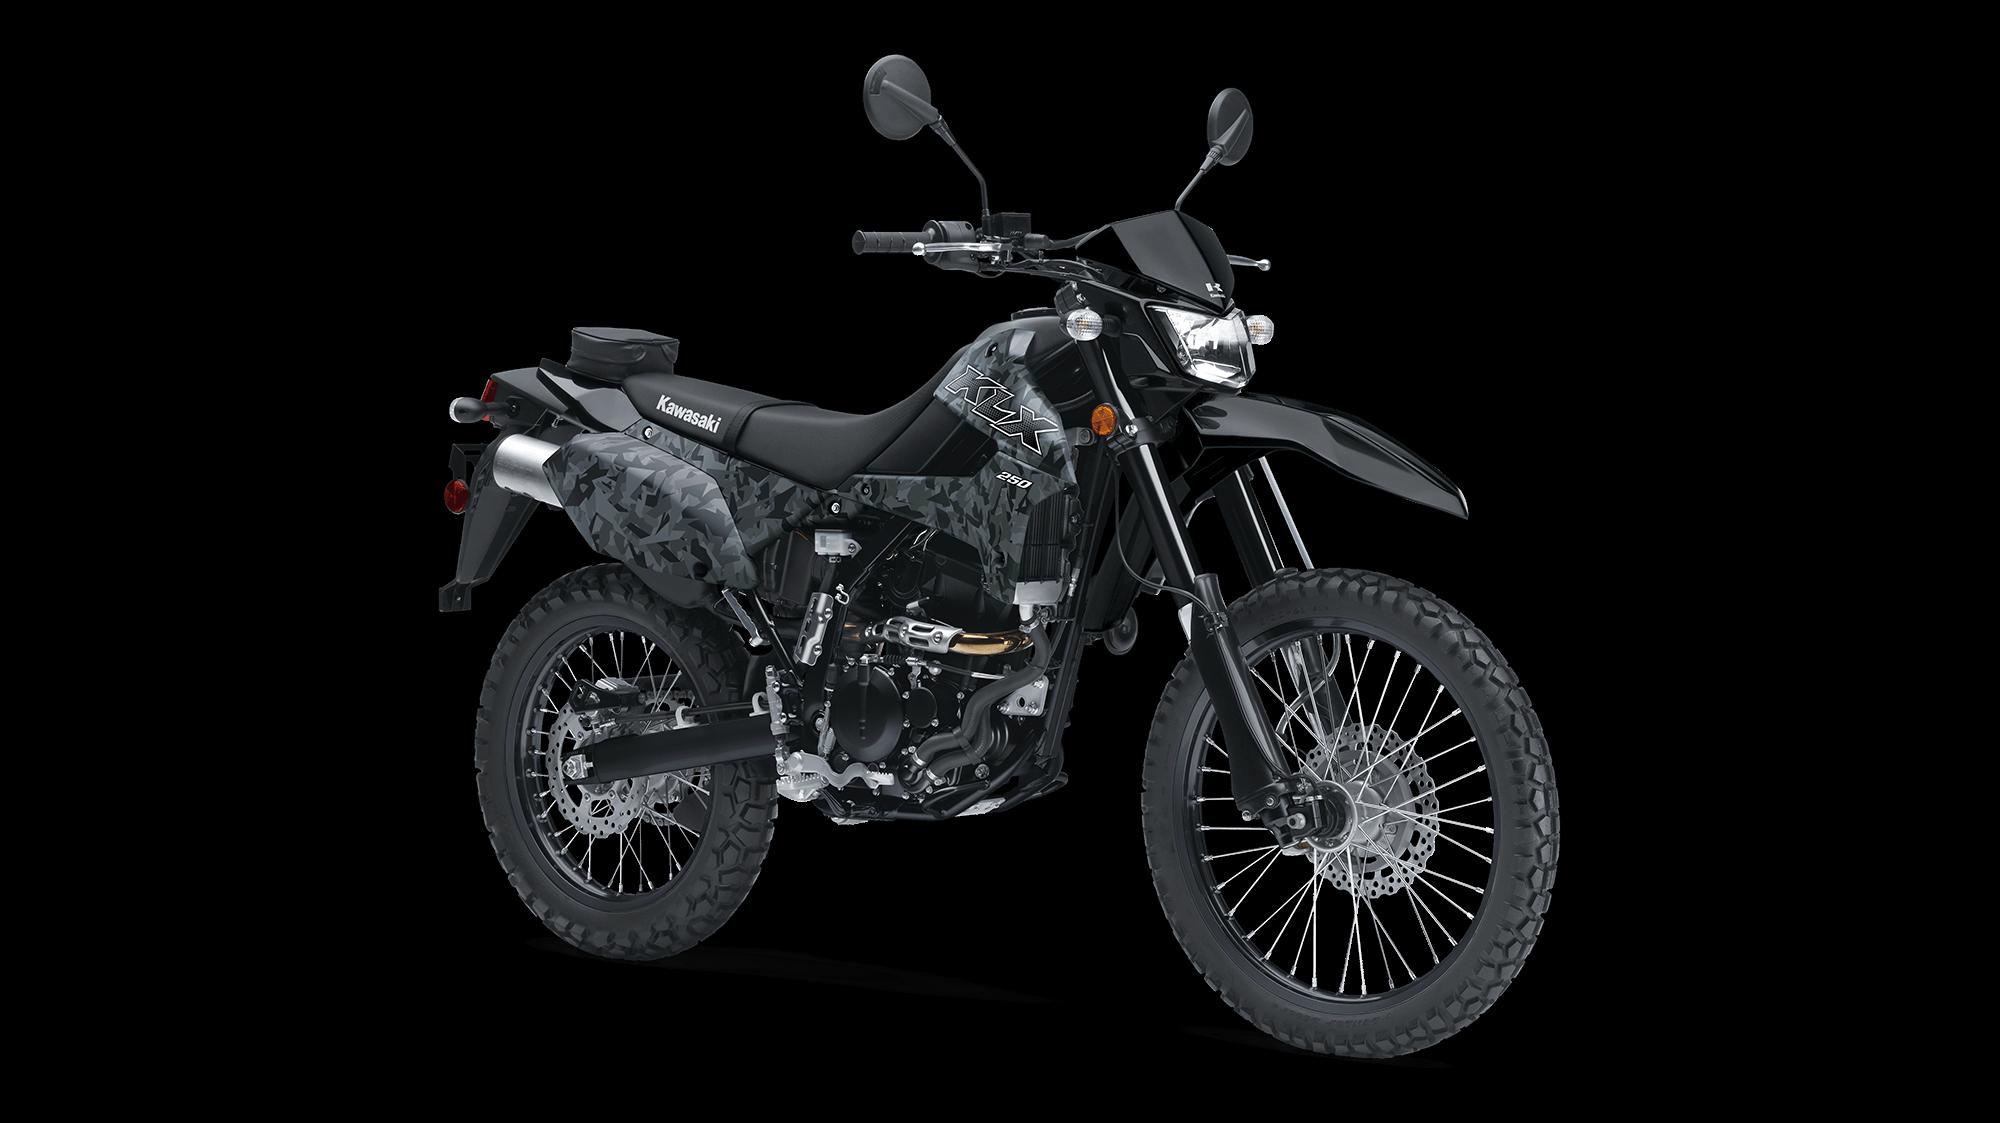 2020 KLX®250 CAMO KLR™/KLX® Motorcycle by Kawasaki